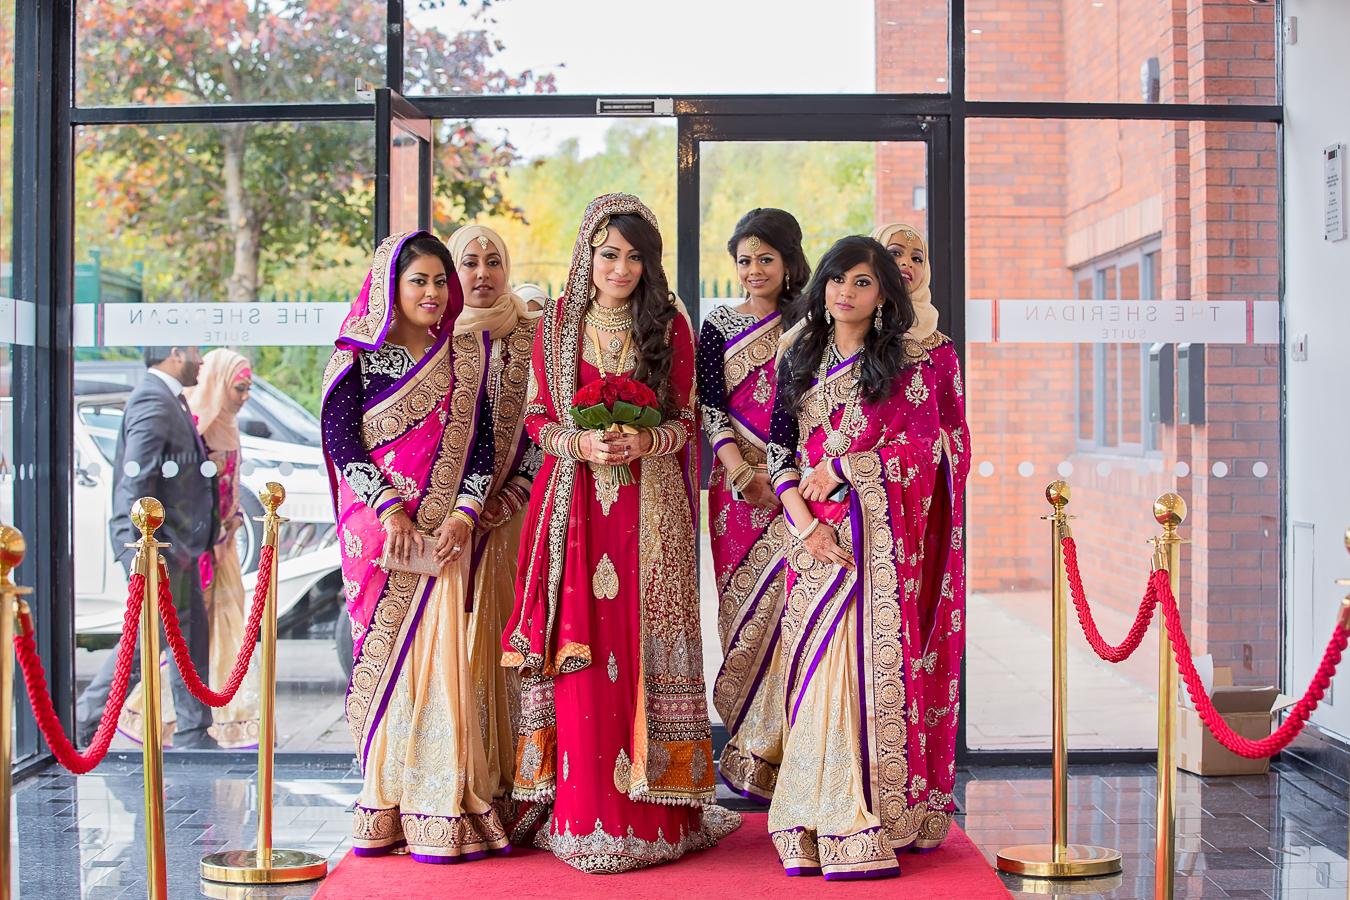 Nasir and Minara wedding at The Sheridan suite Macnchester Didsbury Opu Sultan Photography Manchester and Edinburgh Asian Muslim Hindu Sikh-40.jpg